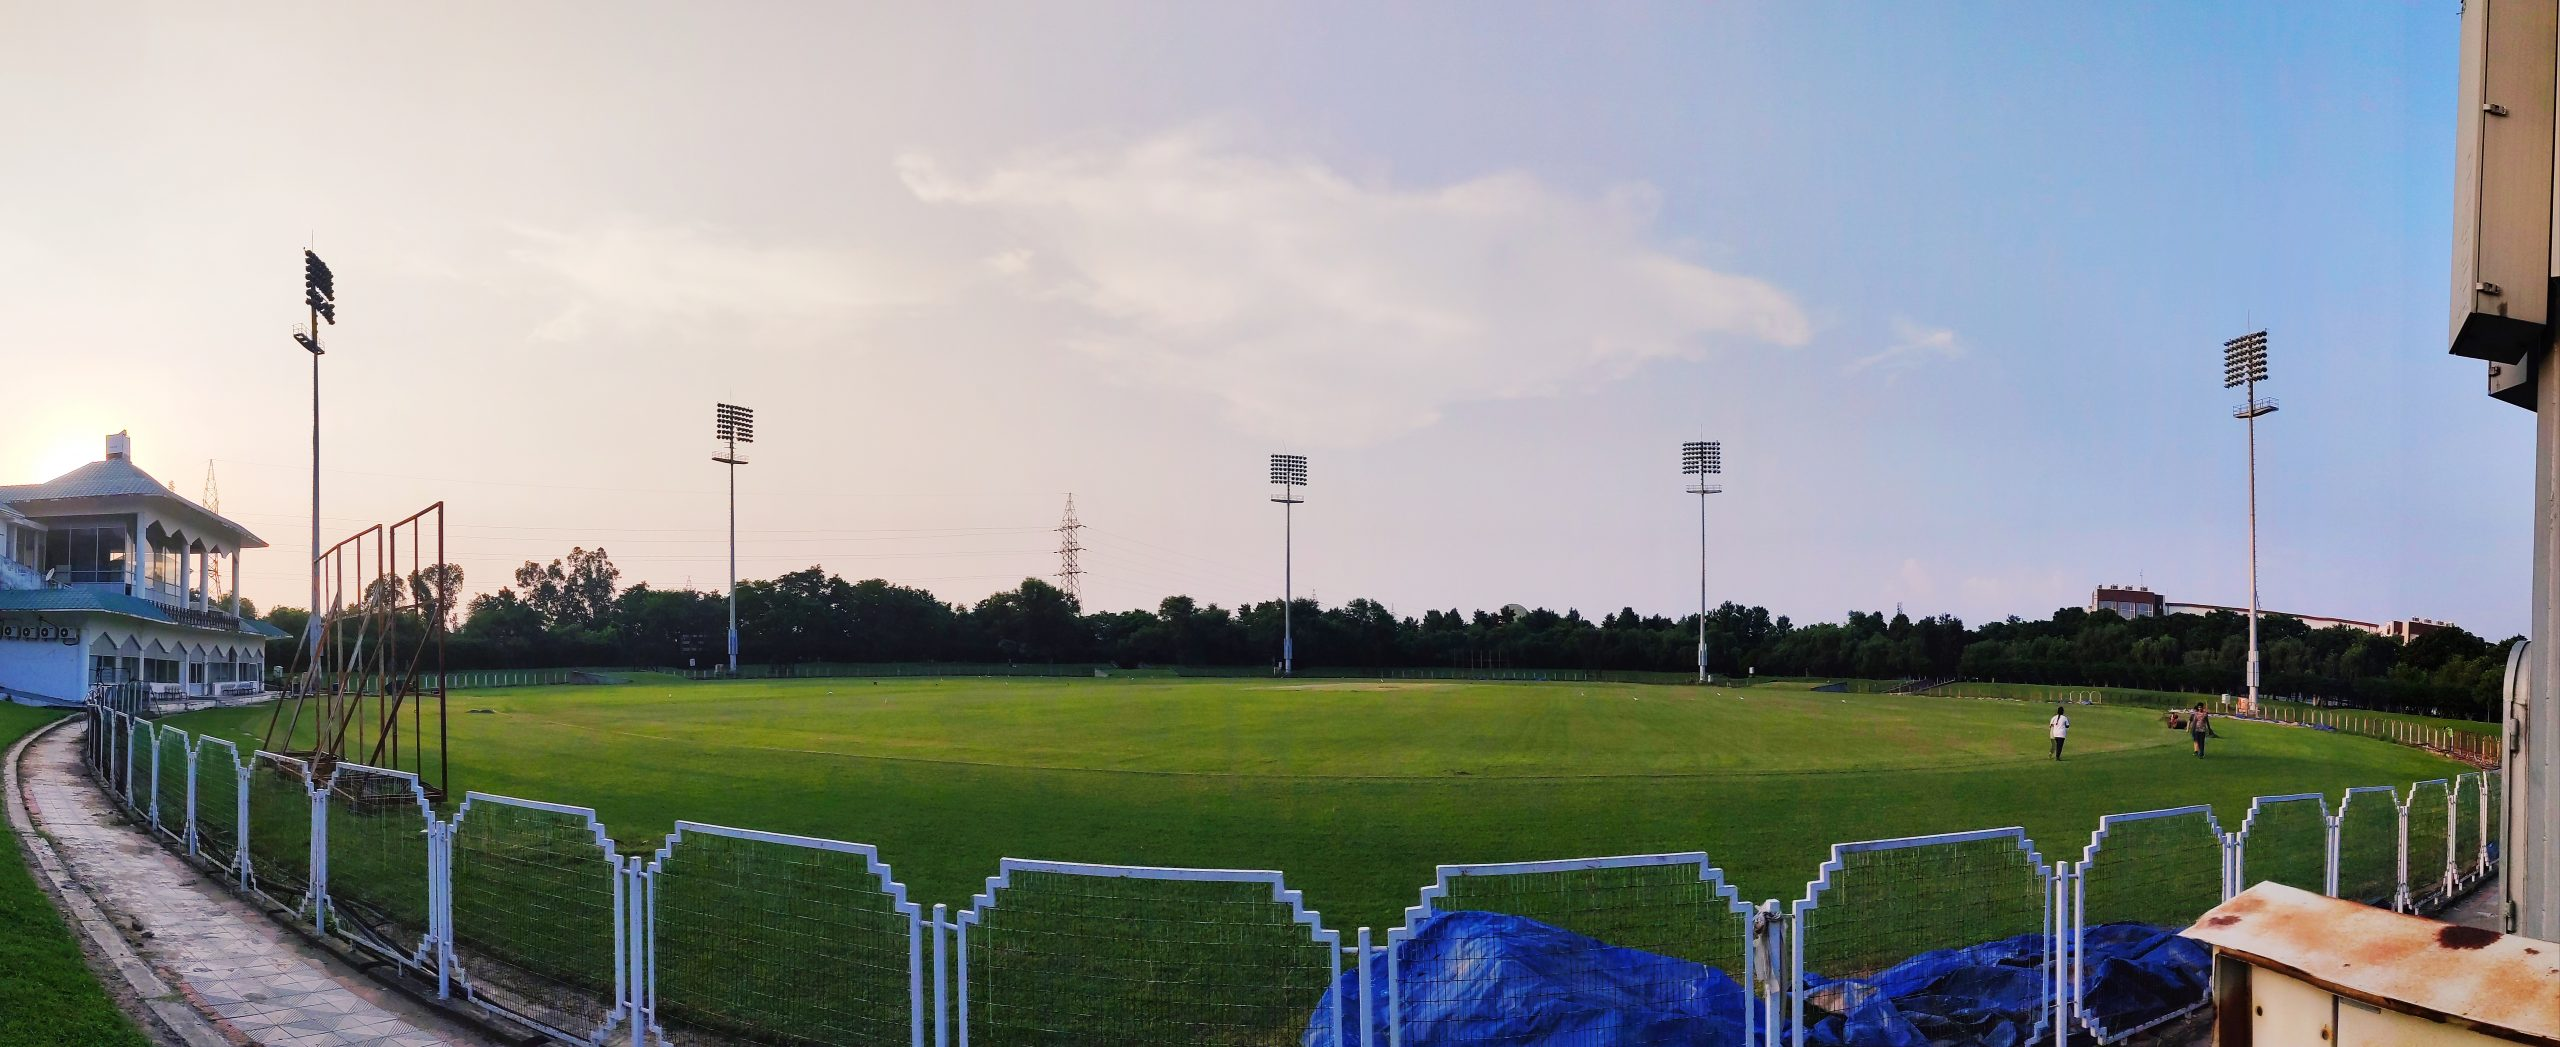 Cricket stadium panorama